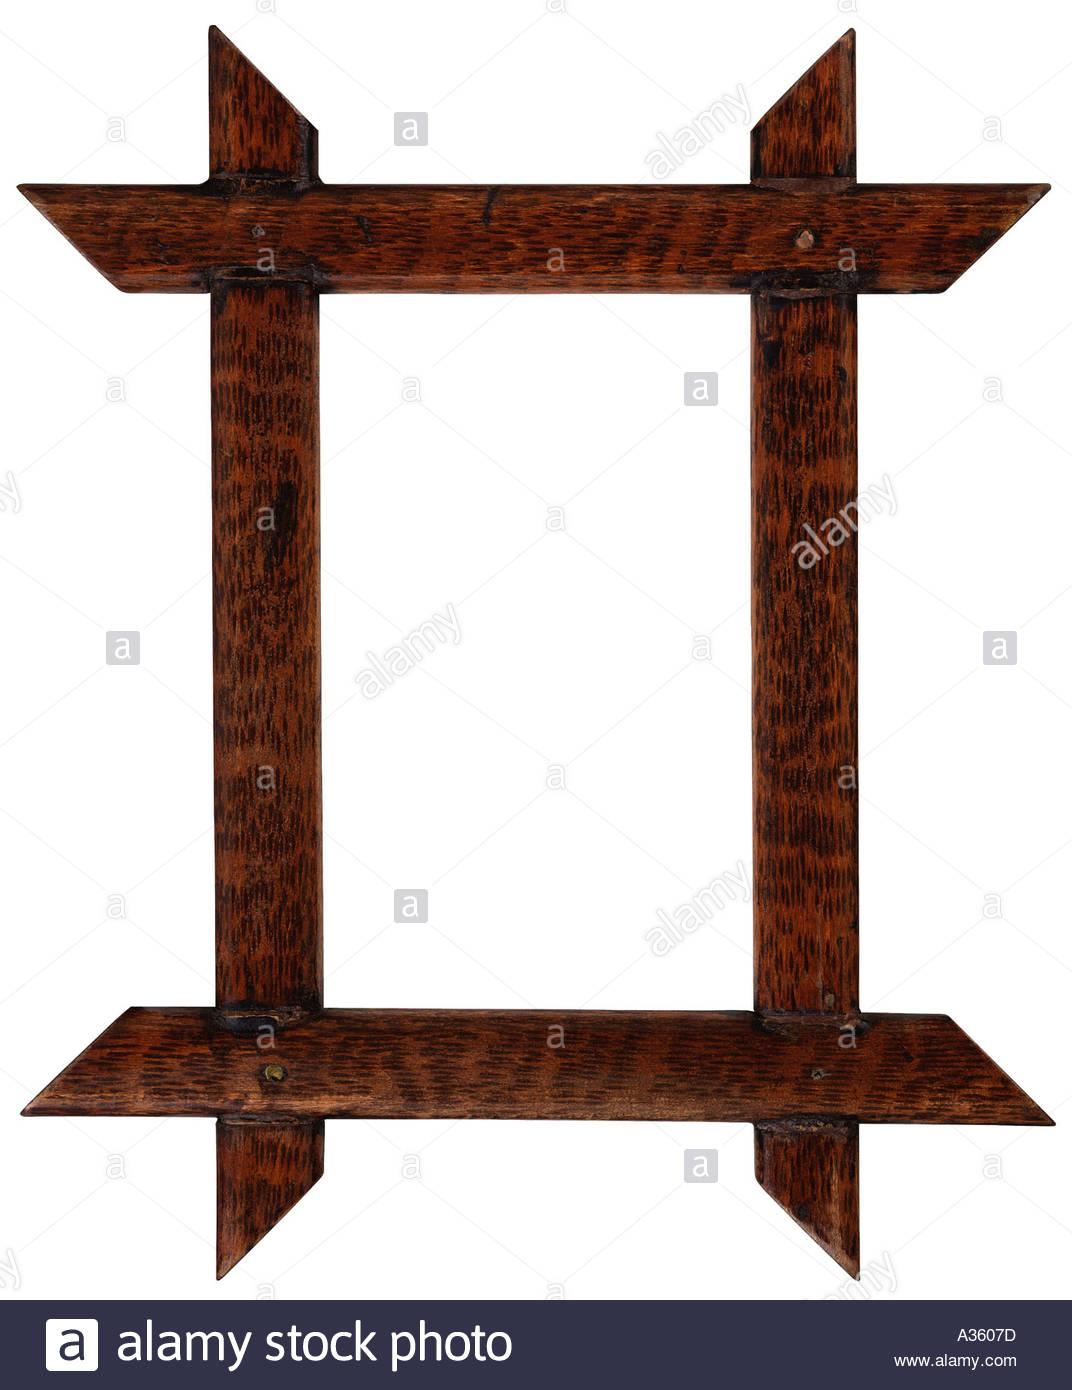 Vertical Rectangular Decorative Wooden Frame Stock Photos.